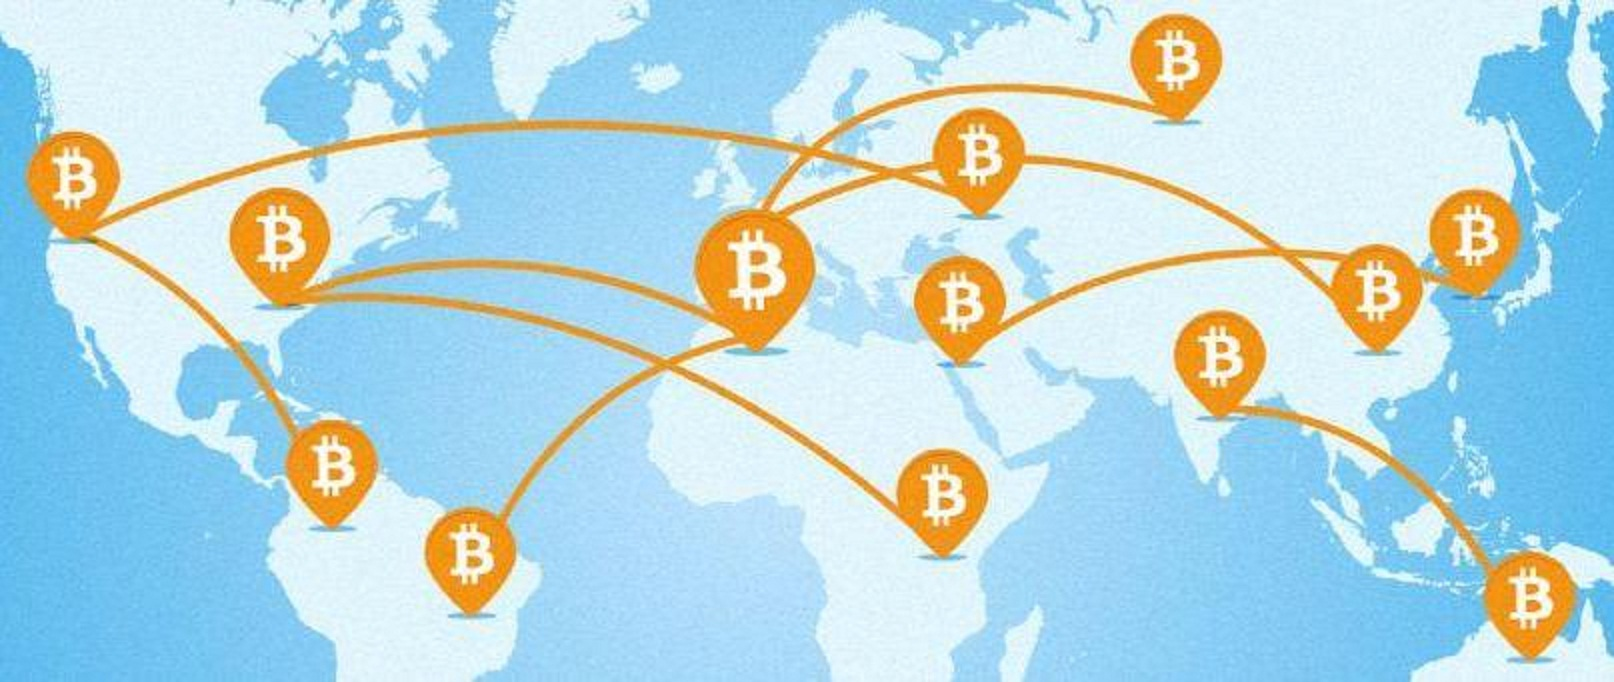 tret'e svojstvo bitkoina - perevod bez granic i posrednikov